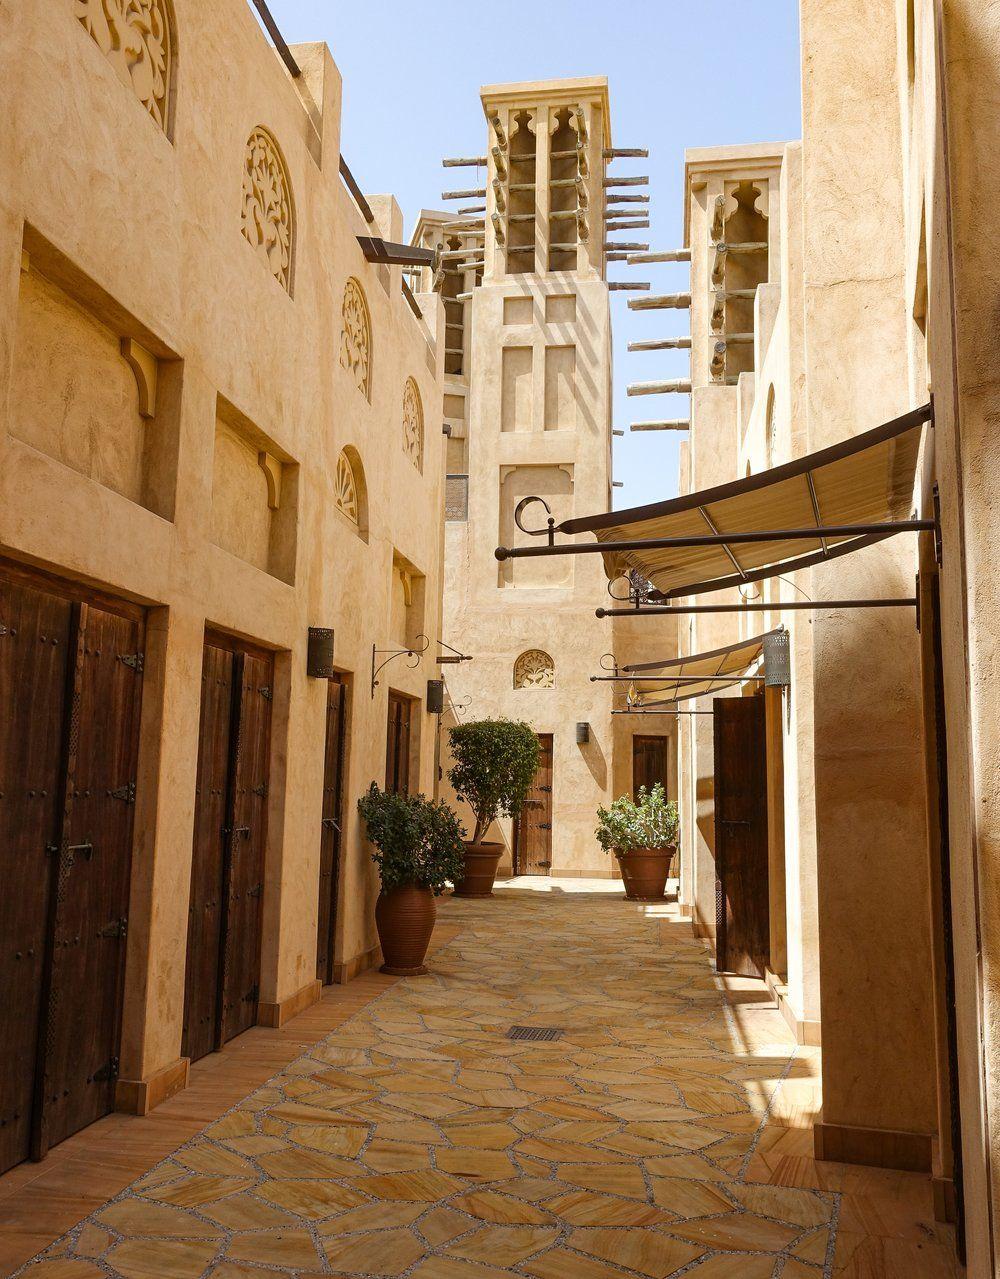 10 Things To Do in Doha, Qatar